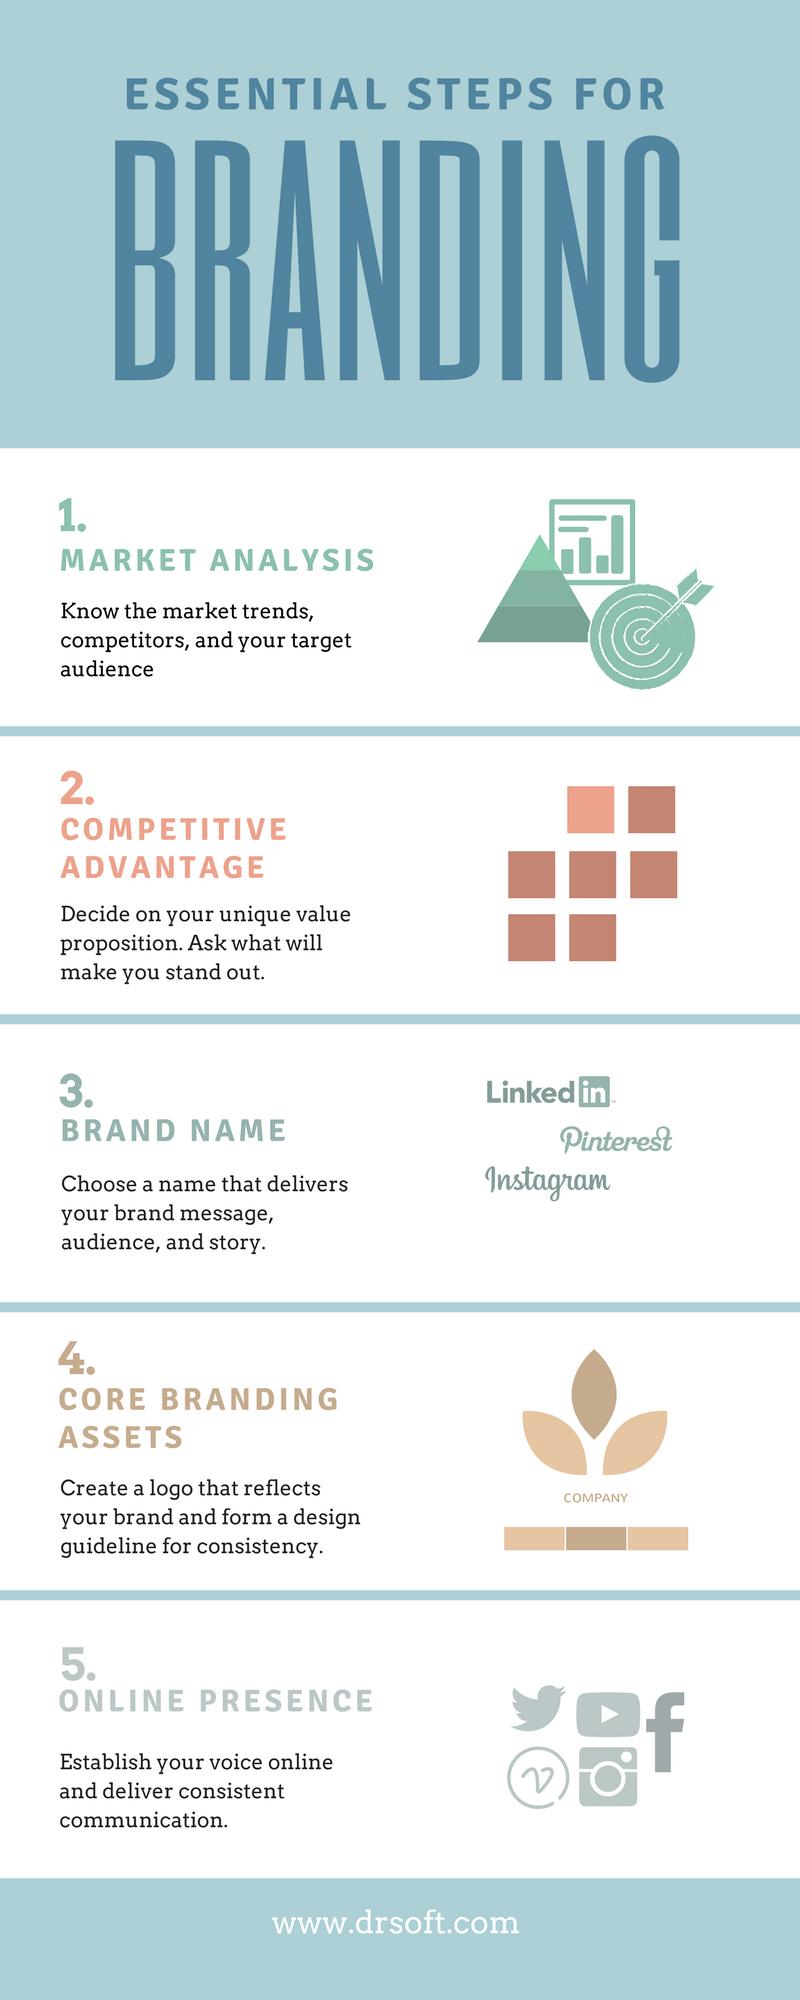 Amazon Profitable Wholesale Products Guide 2019 Digital Marketing Social Media Digital Marketing Marketing Strategy Template